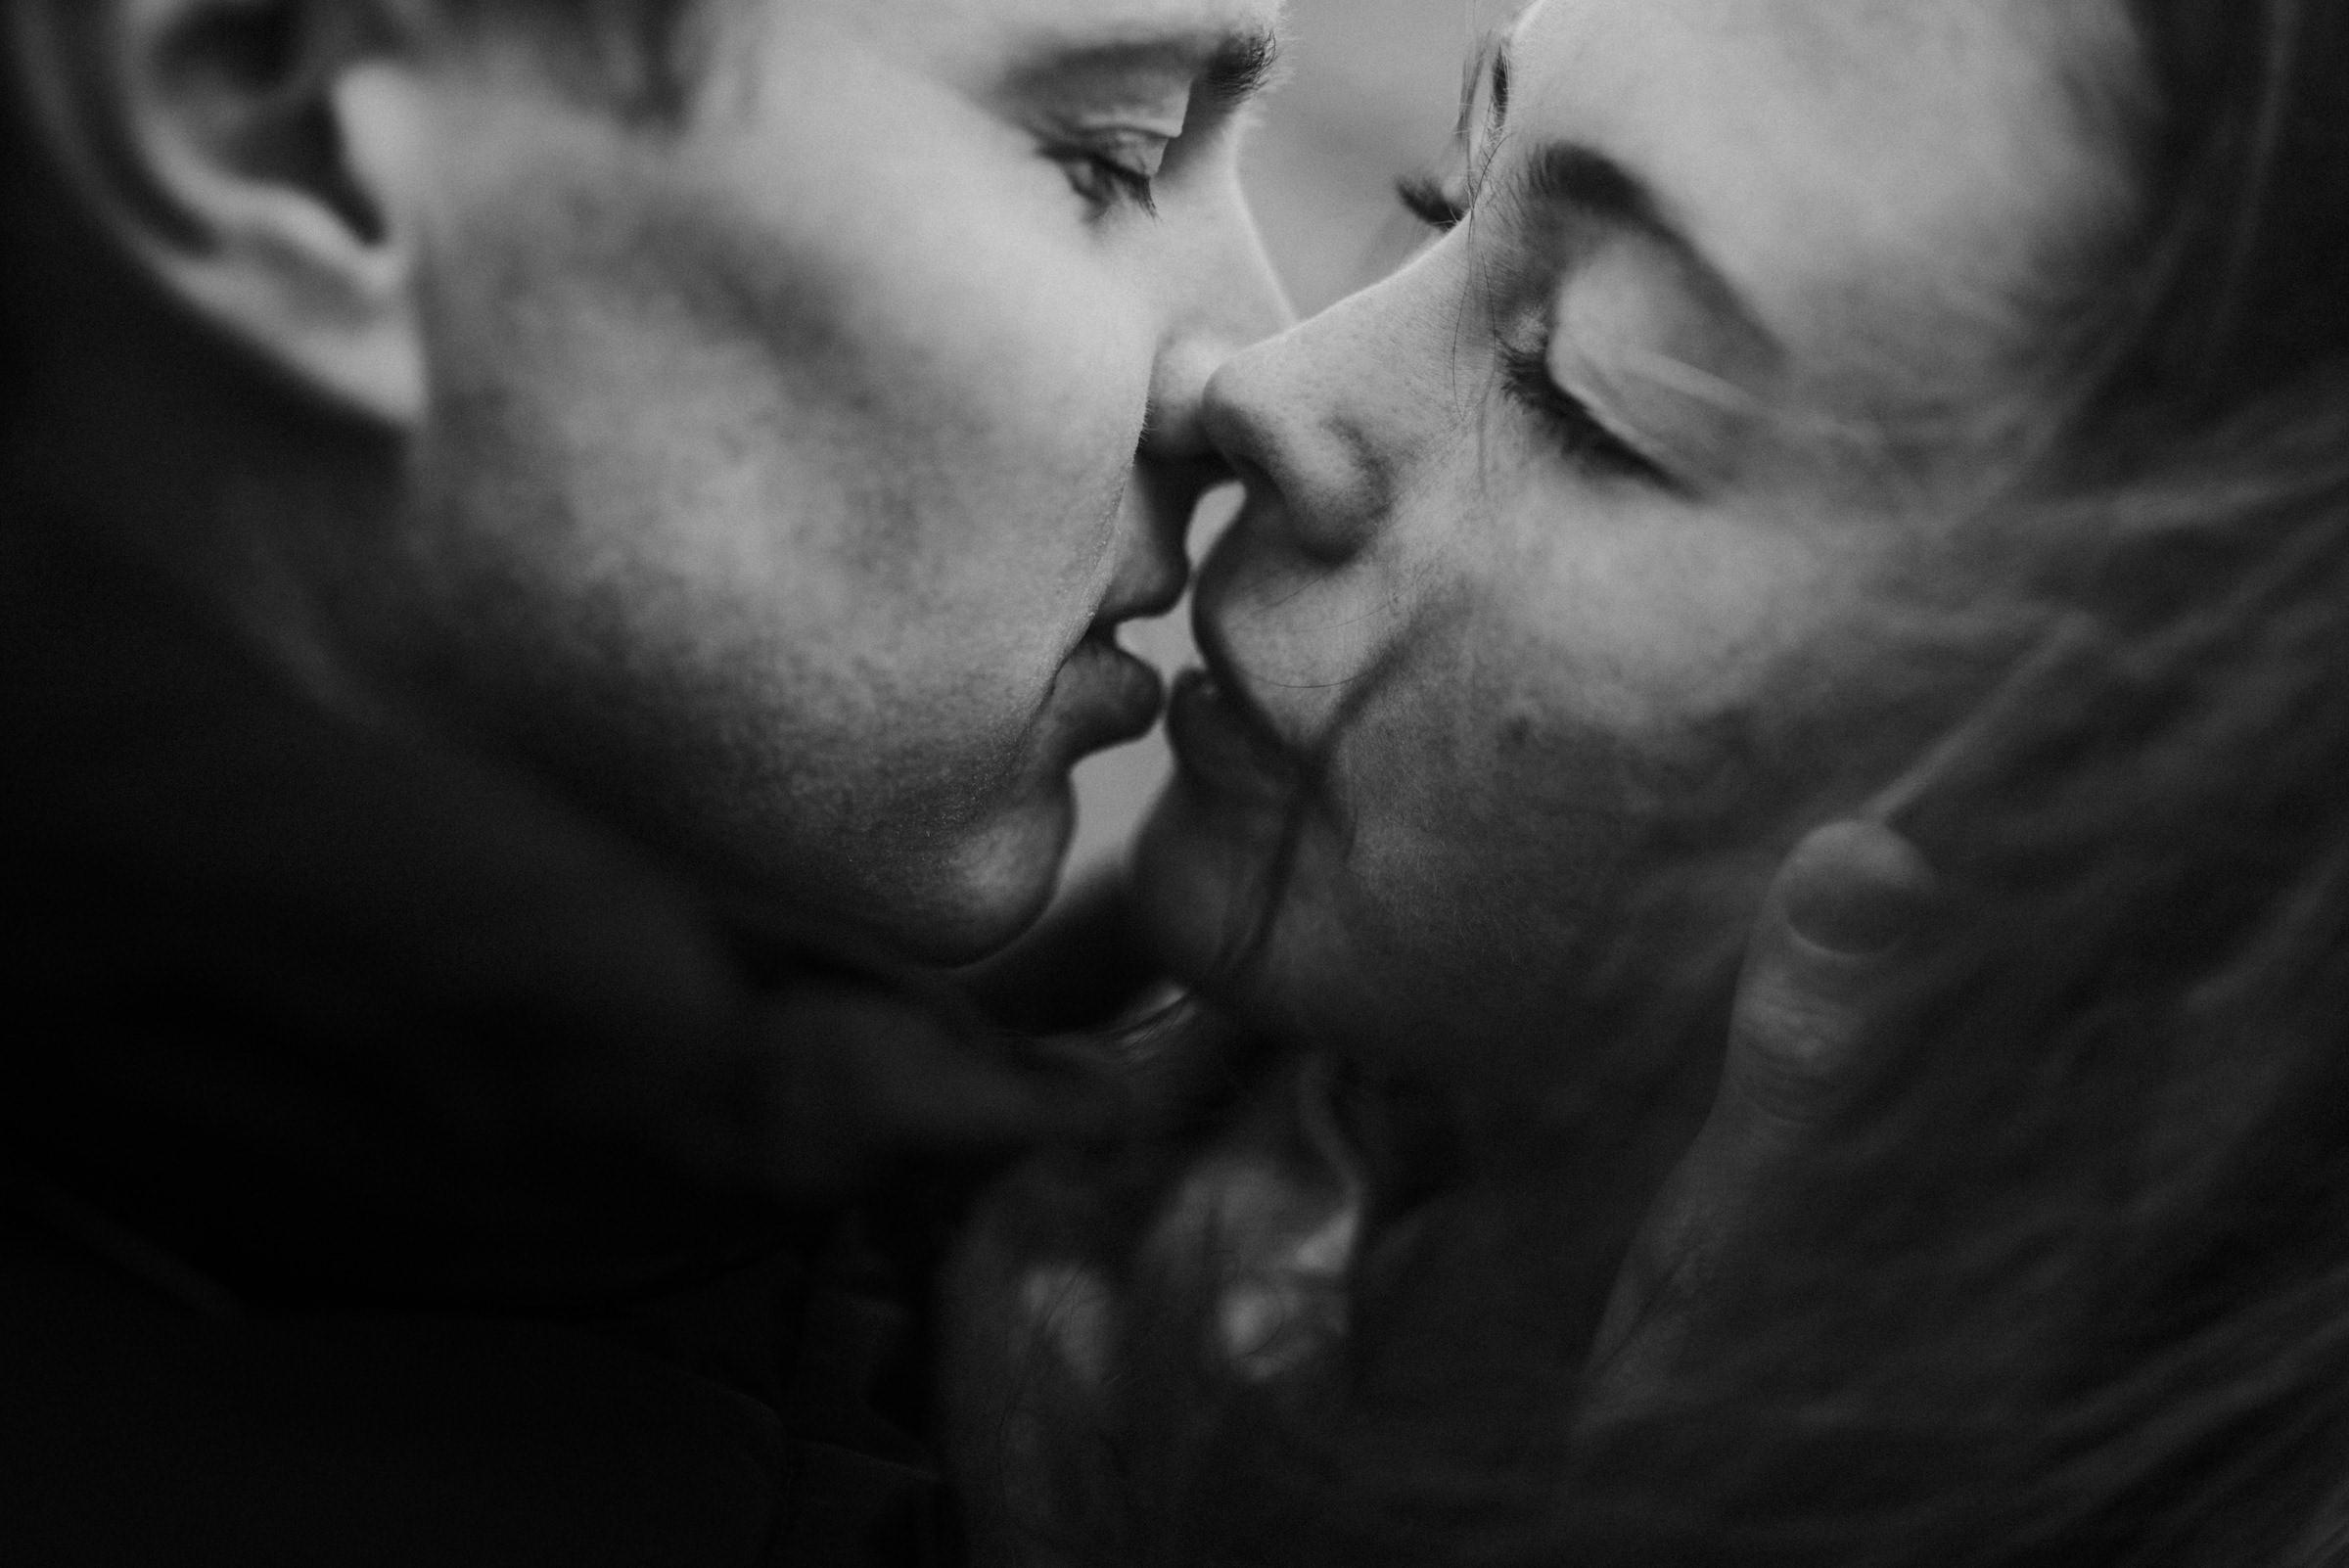 Closeup of couple kissing - photo by Naomi van der Kraan